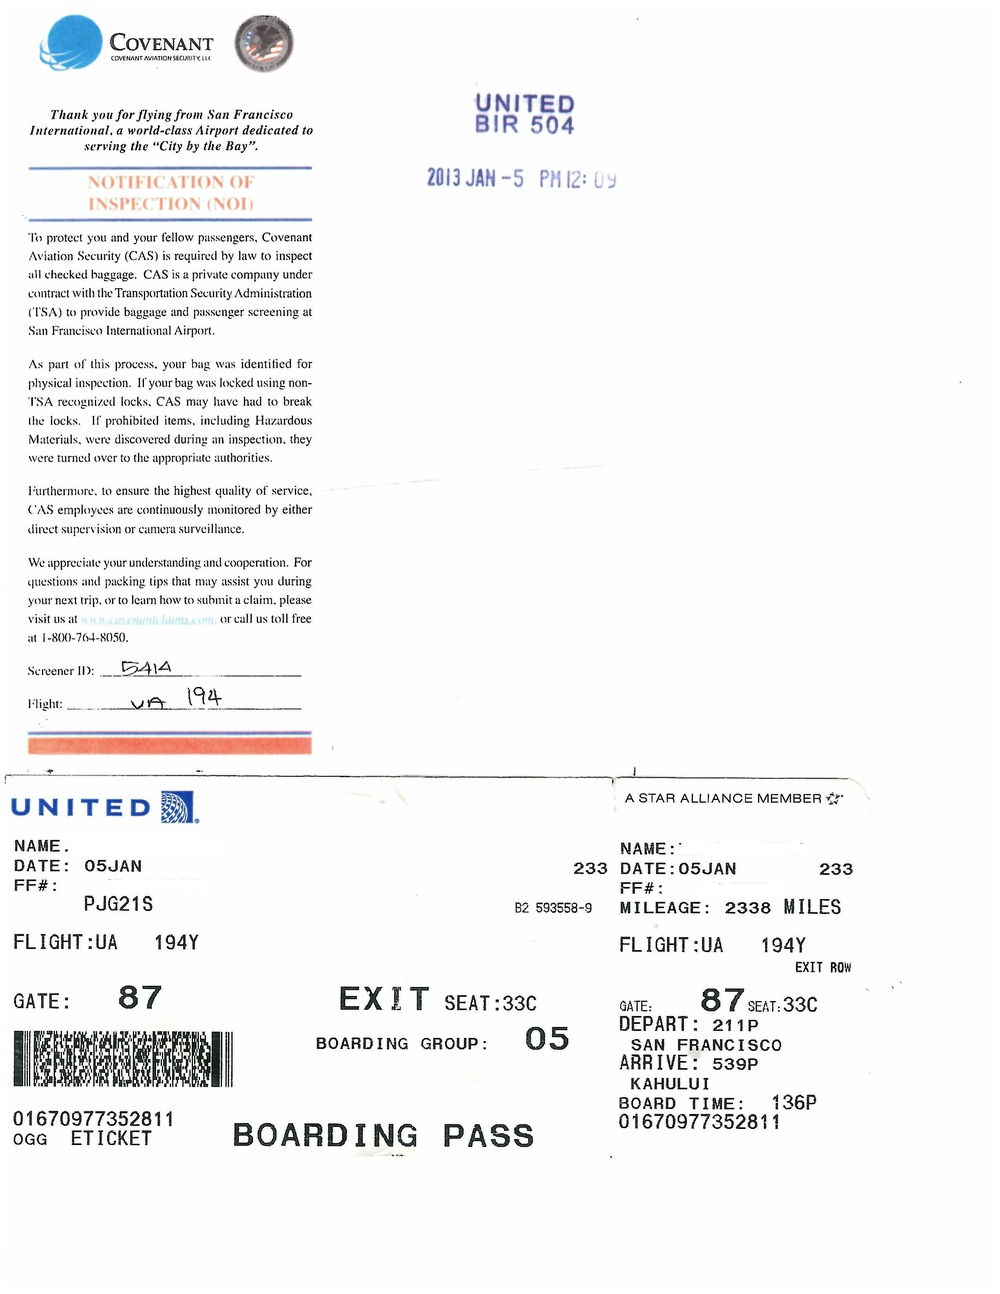 The Infamous TSA Inspection Slip